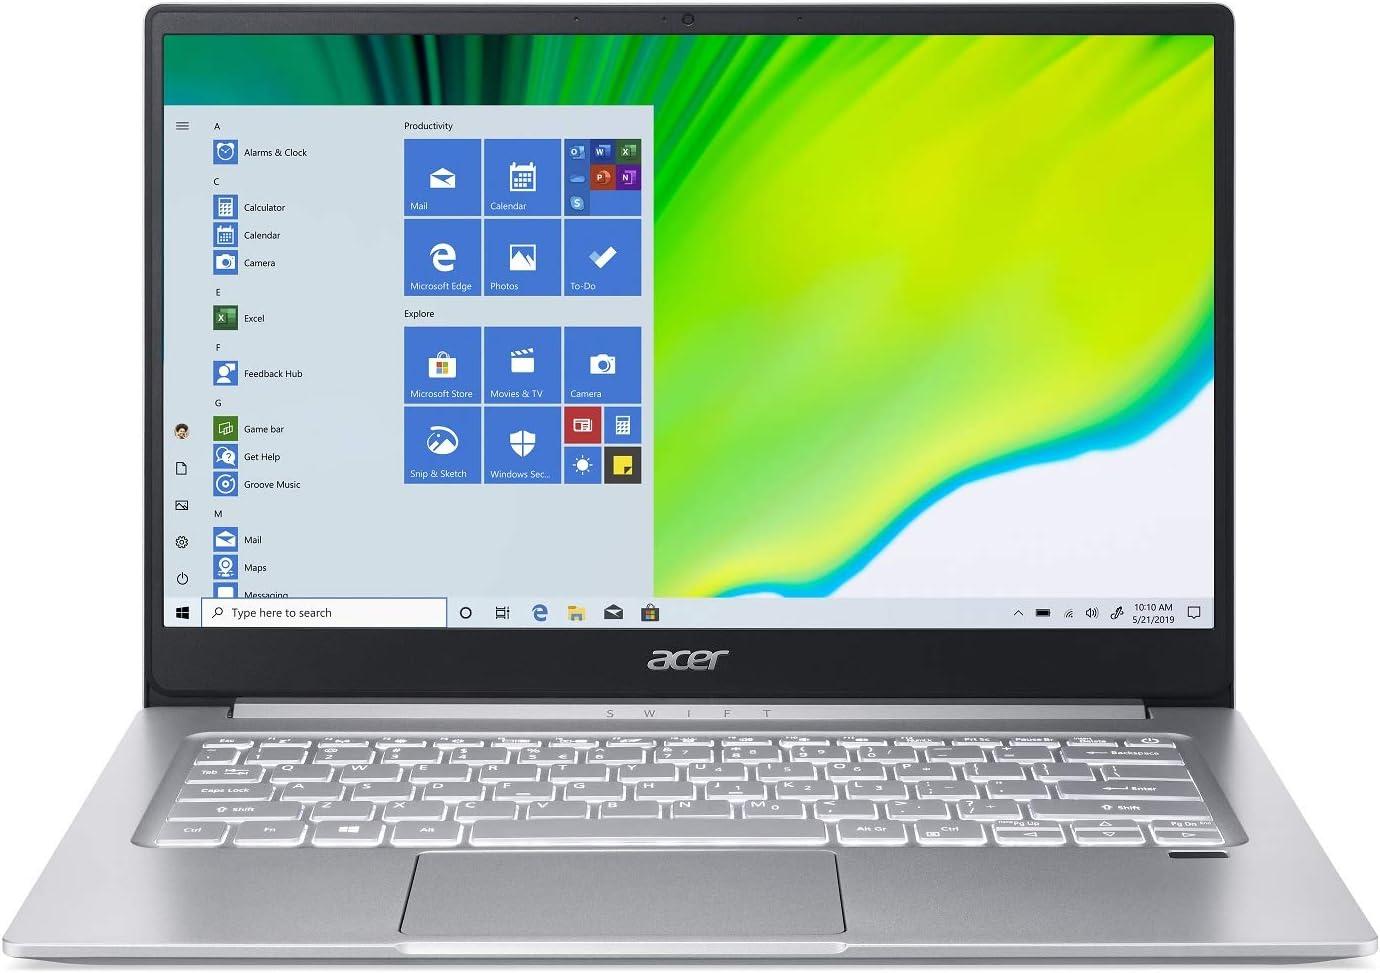 10 Best Cheap Gaming Laptop under 600 dollars in 2021